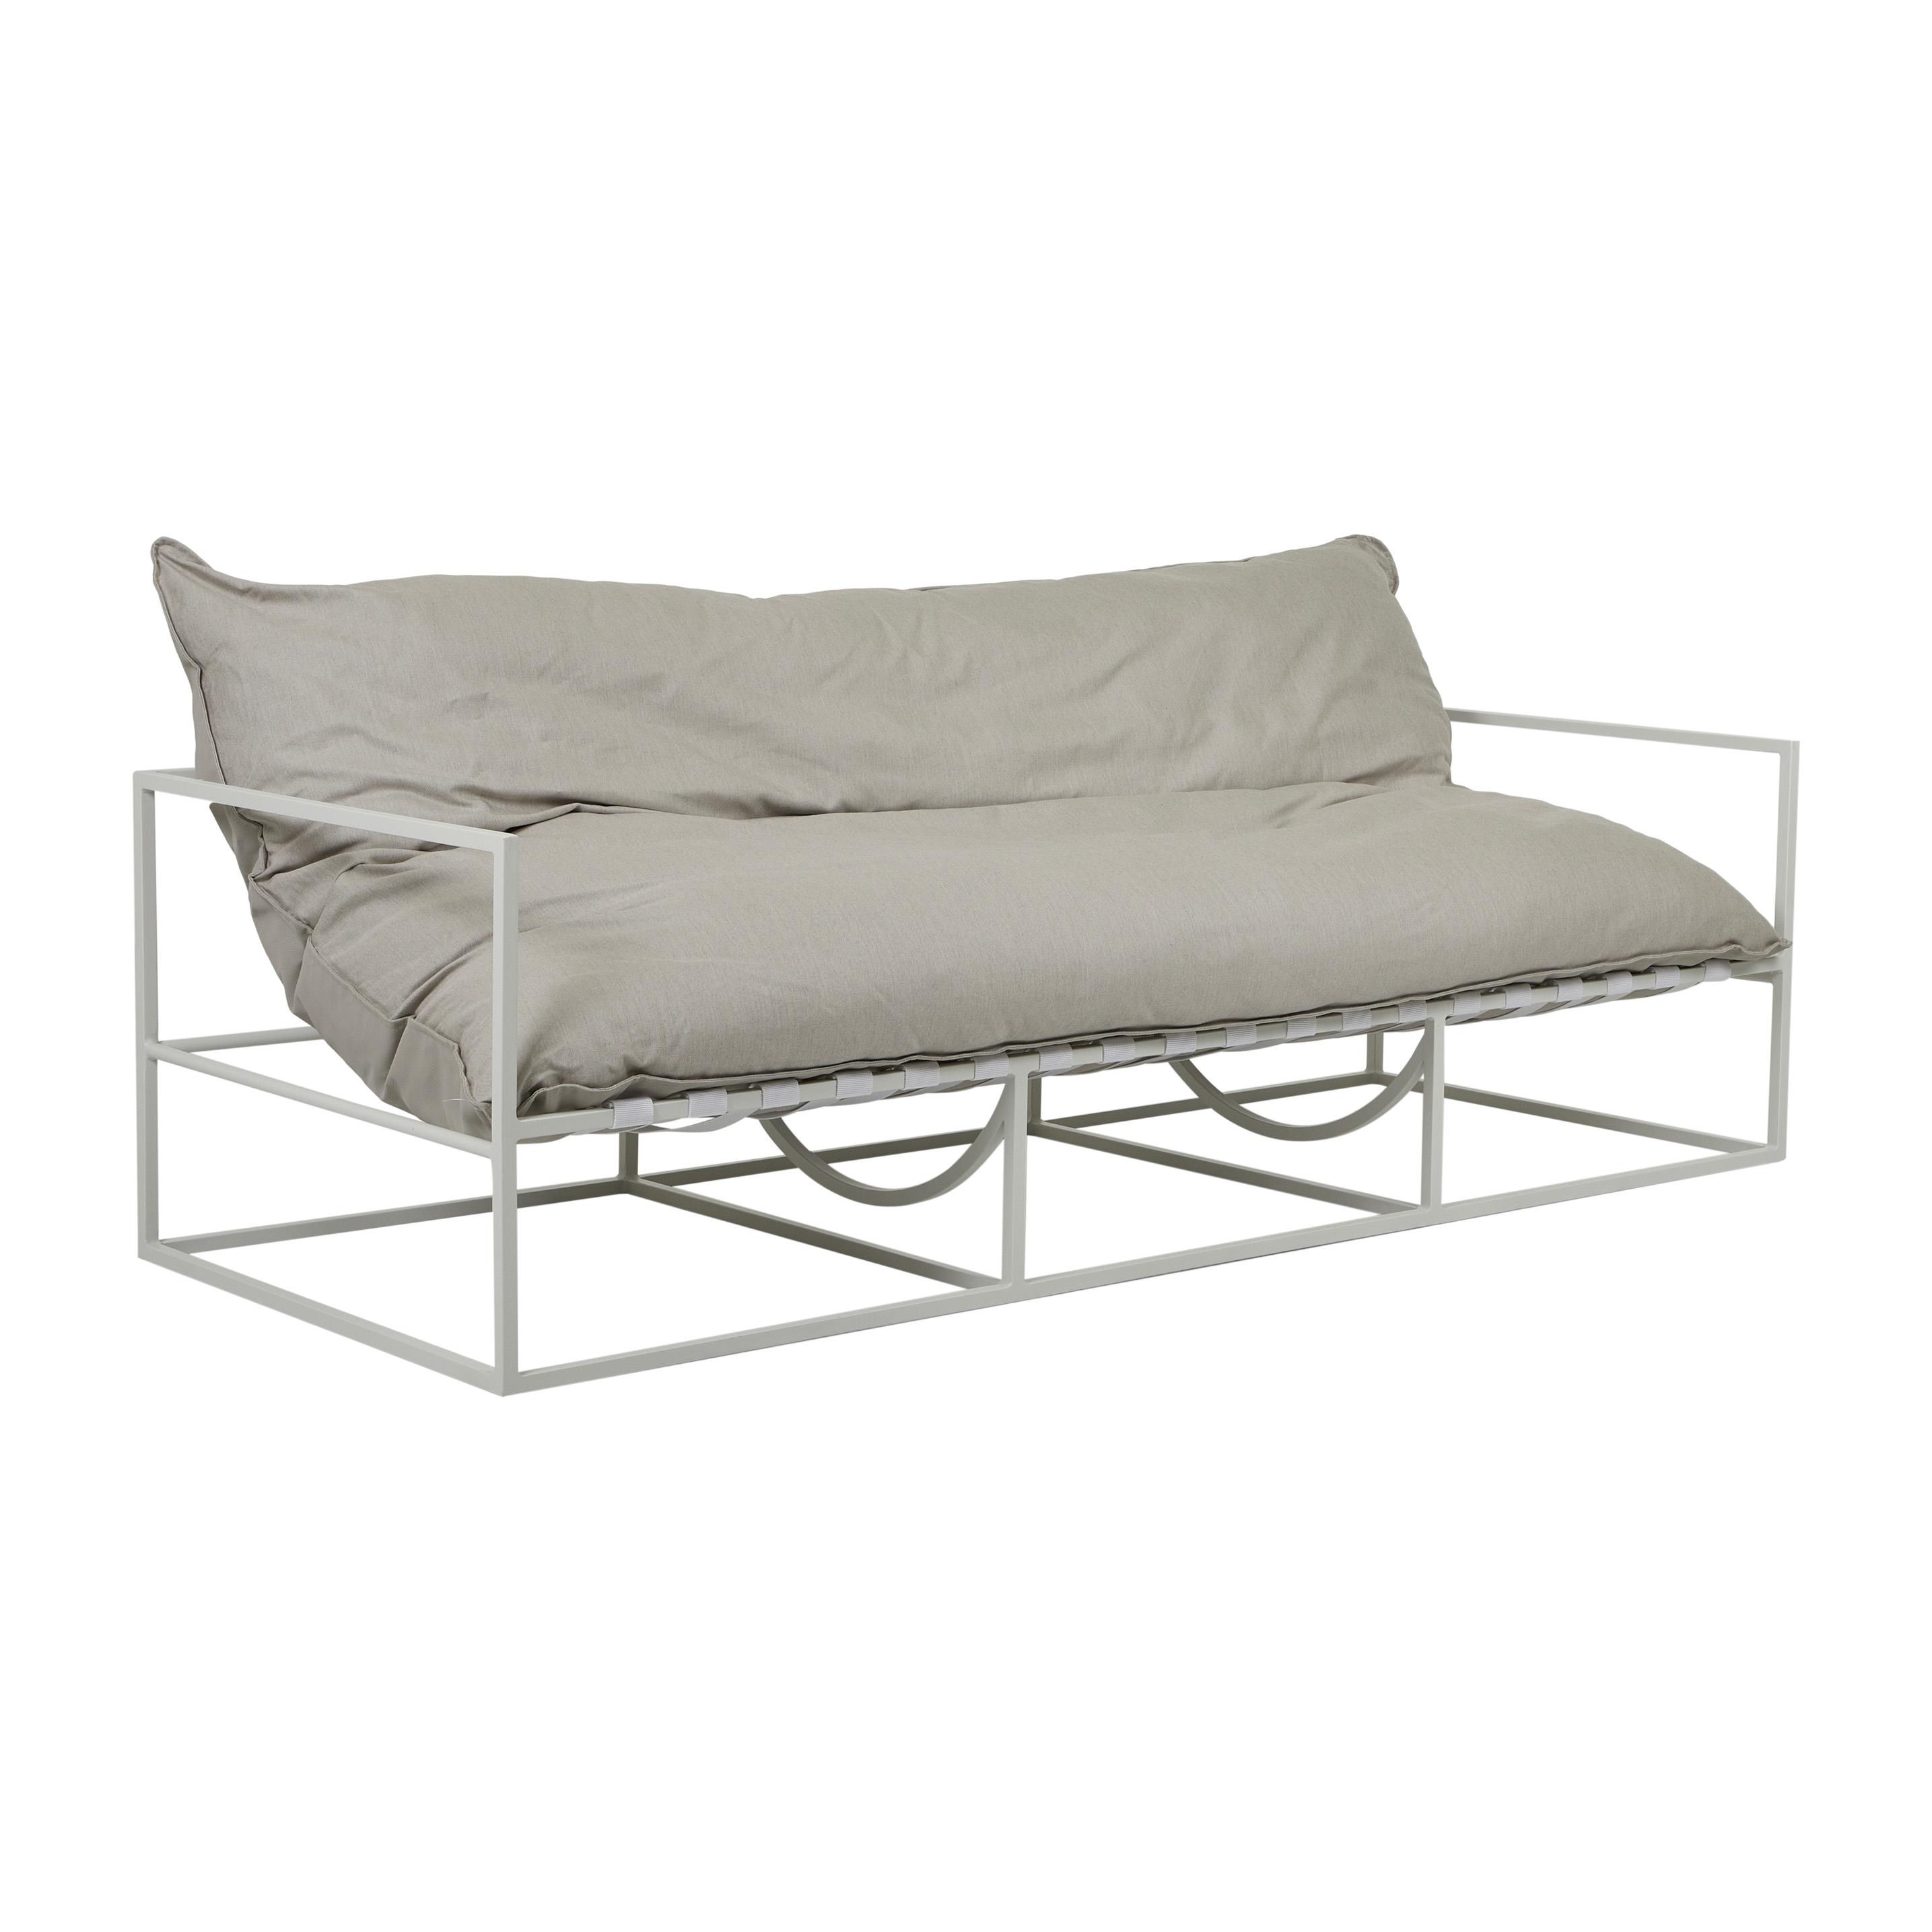 Furniture Hero-Images Sofas aruba-frame-two-seater-01